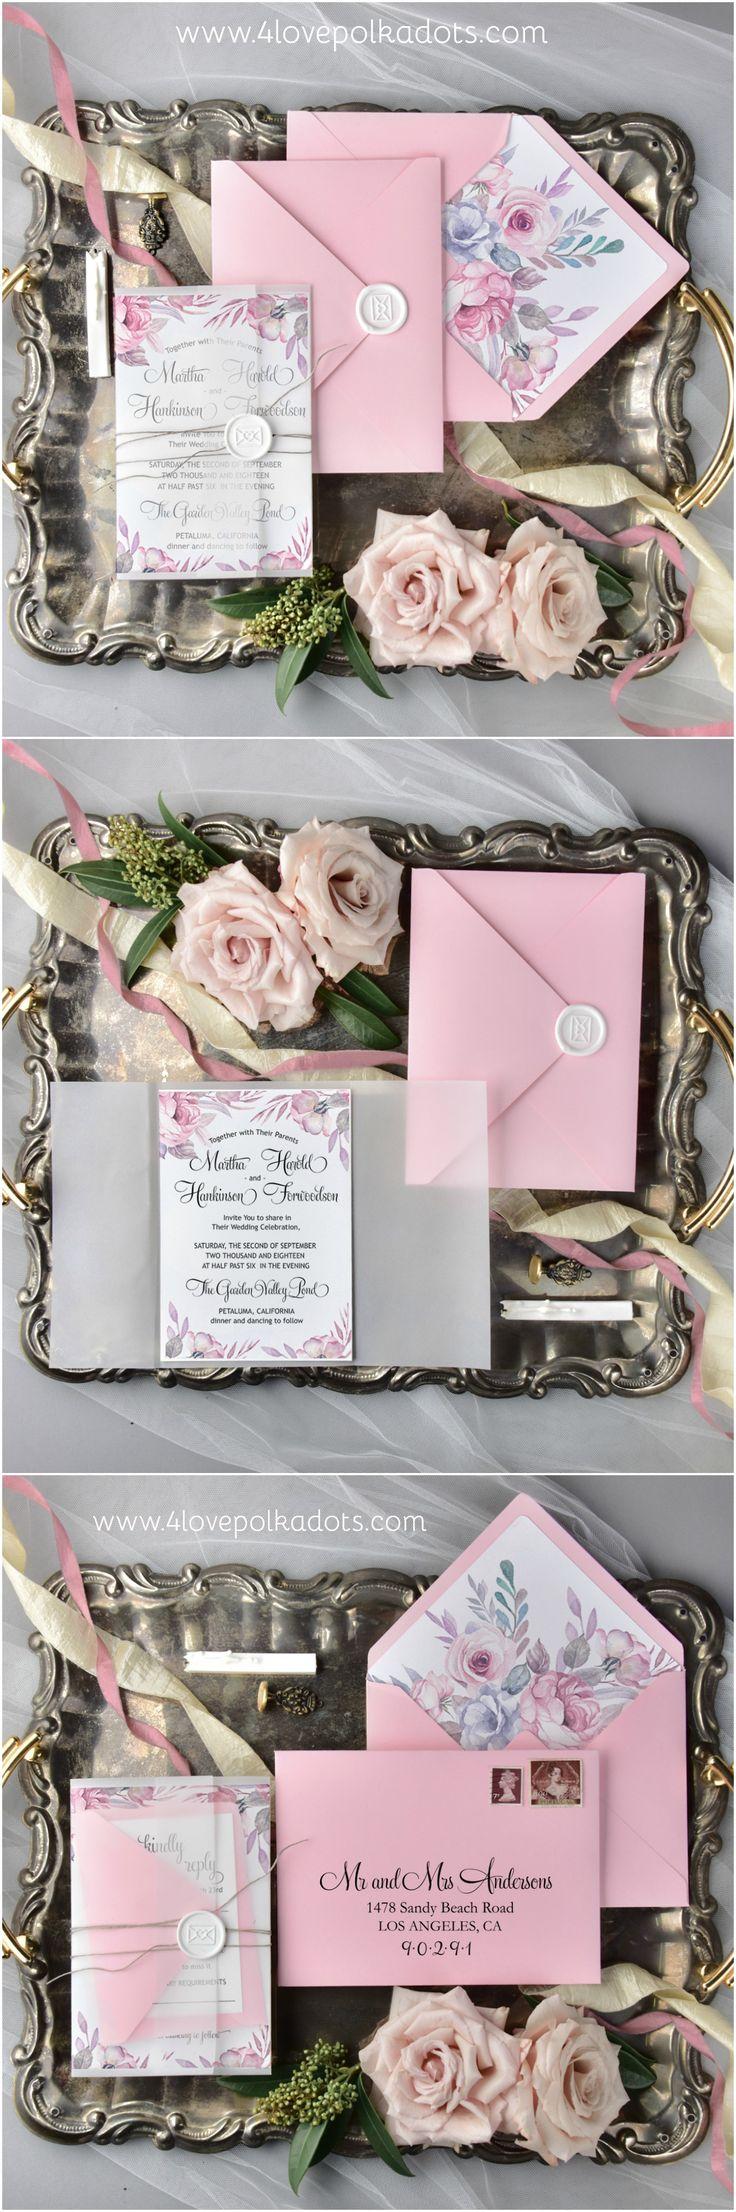 Wedding invitation #4lovepolkadots #weddinginvitations #weddingtheme #pastelwedding #summerwedding #invitations #invitationsideas